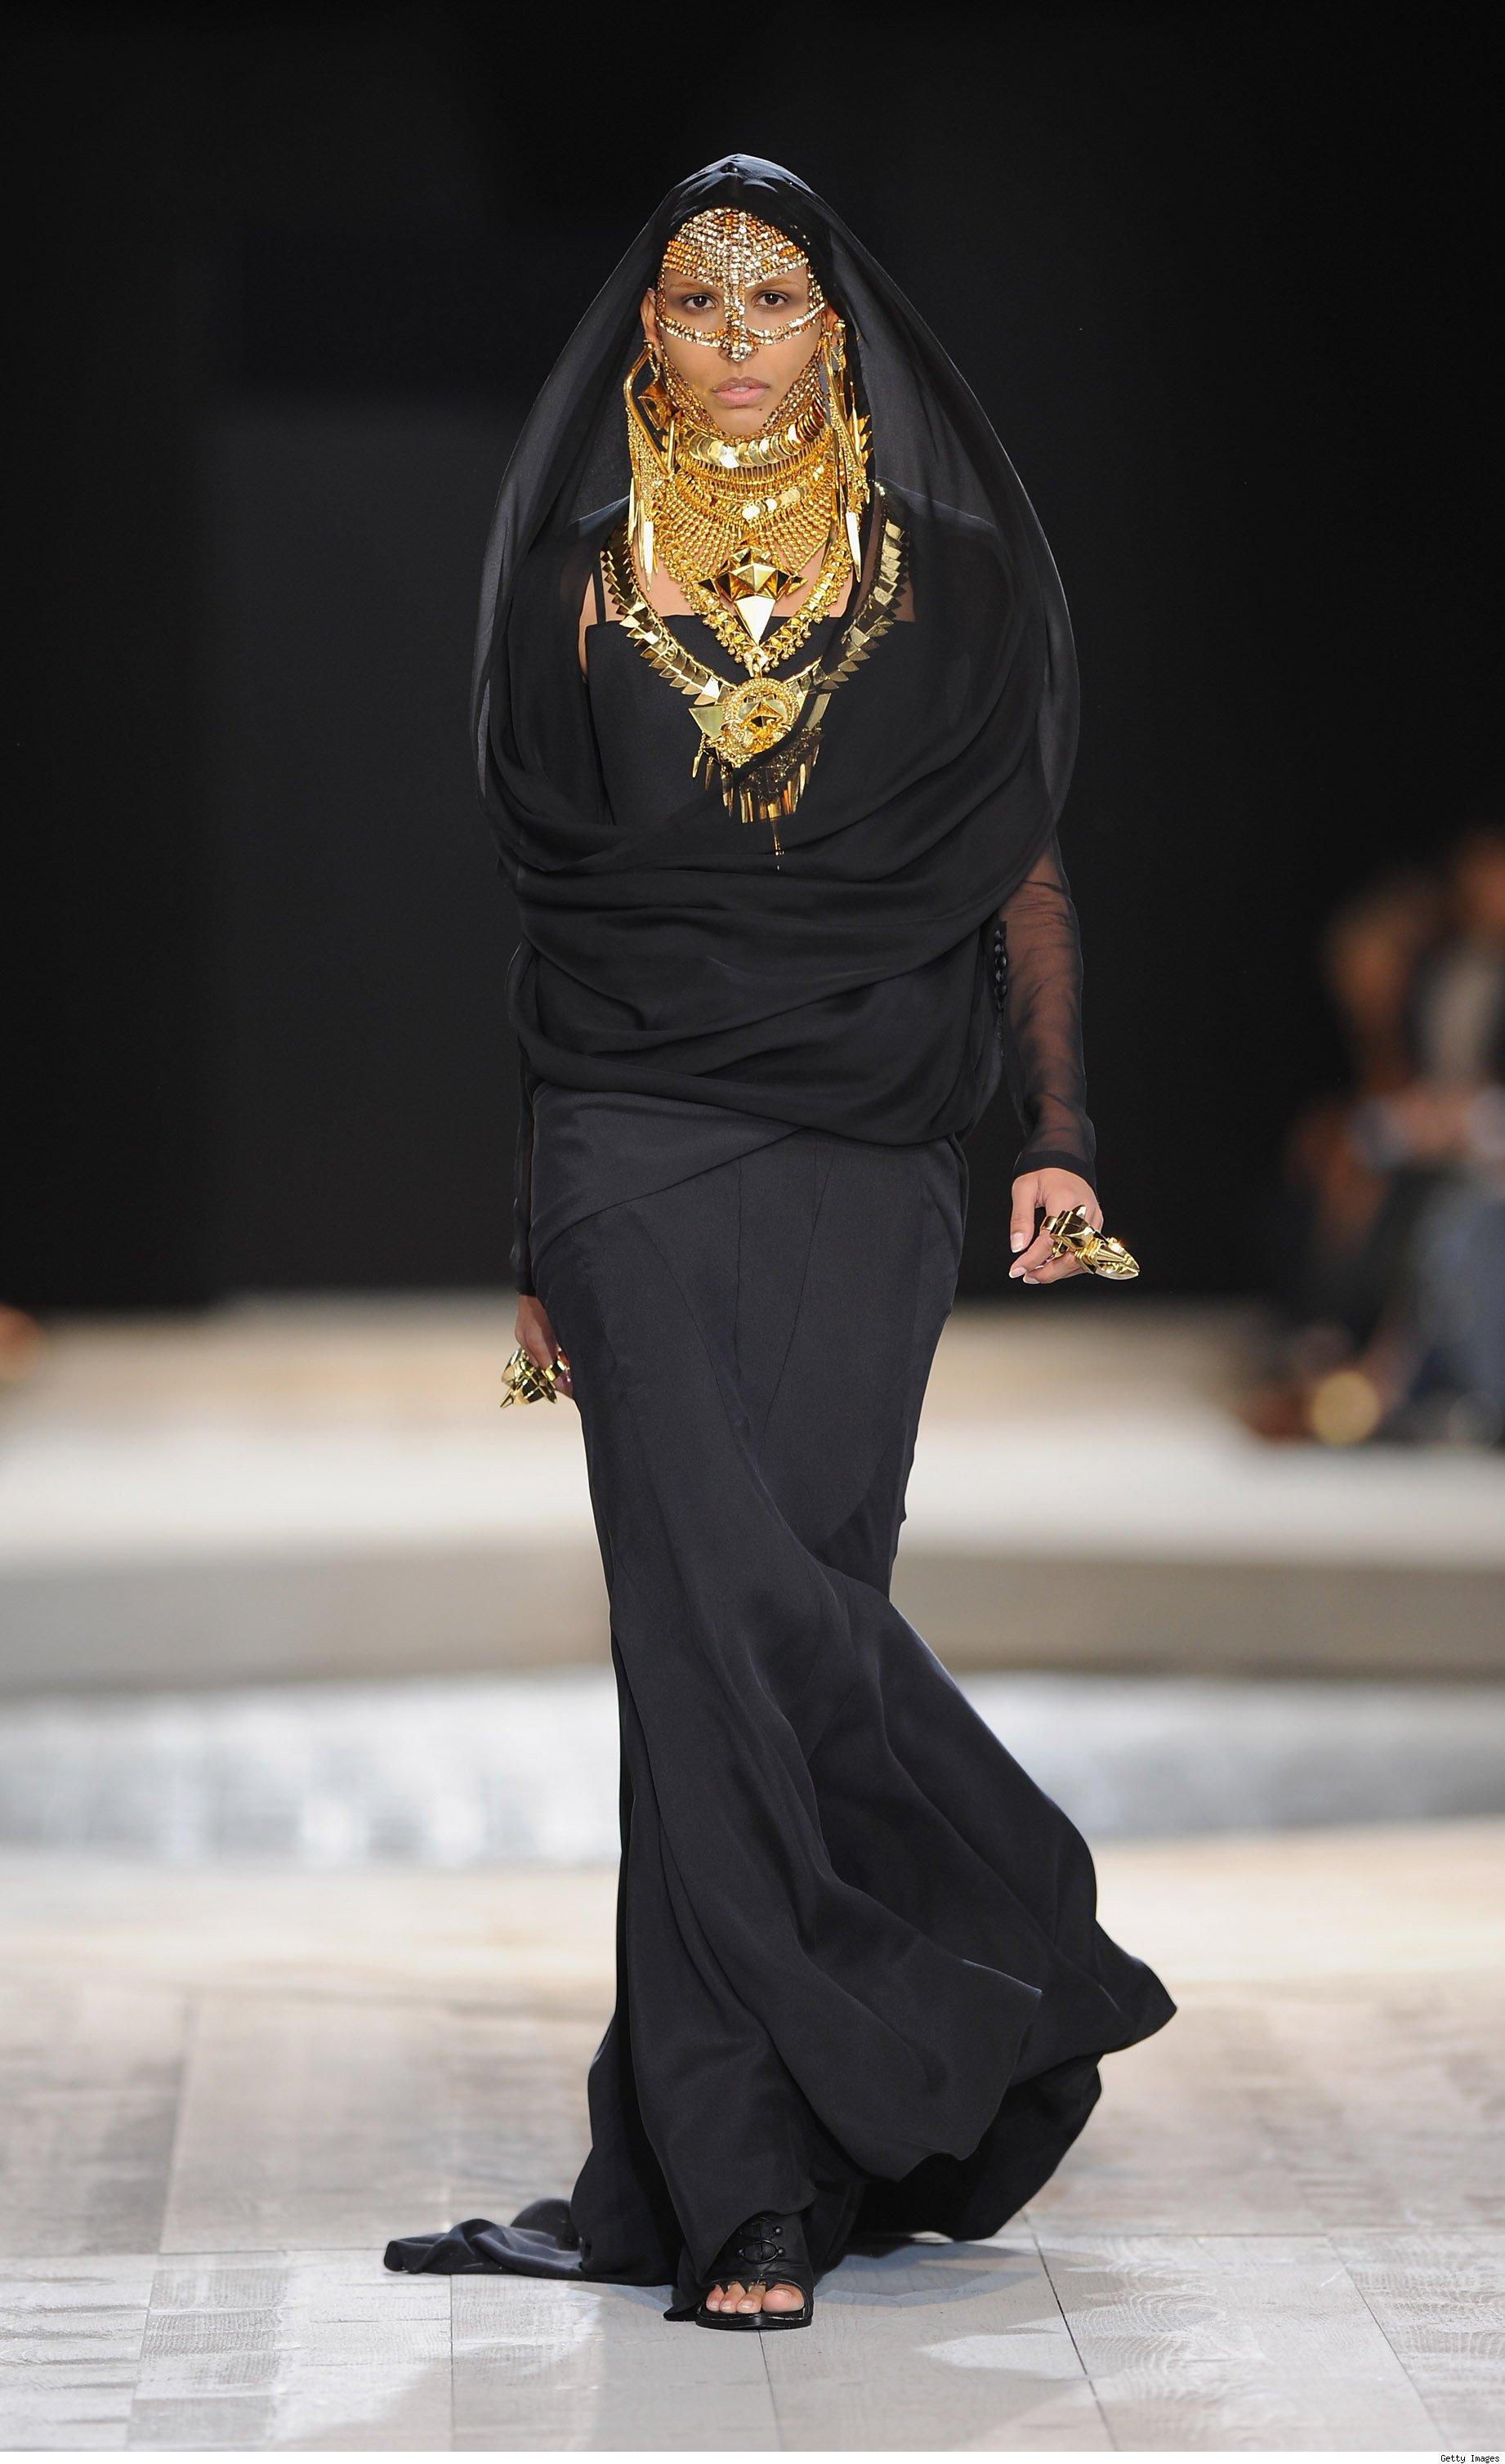 east fashion middle east inspired fashion MLYFNBG